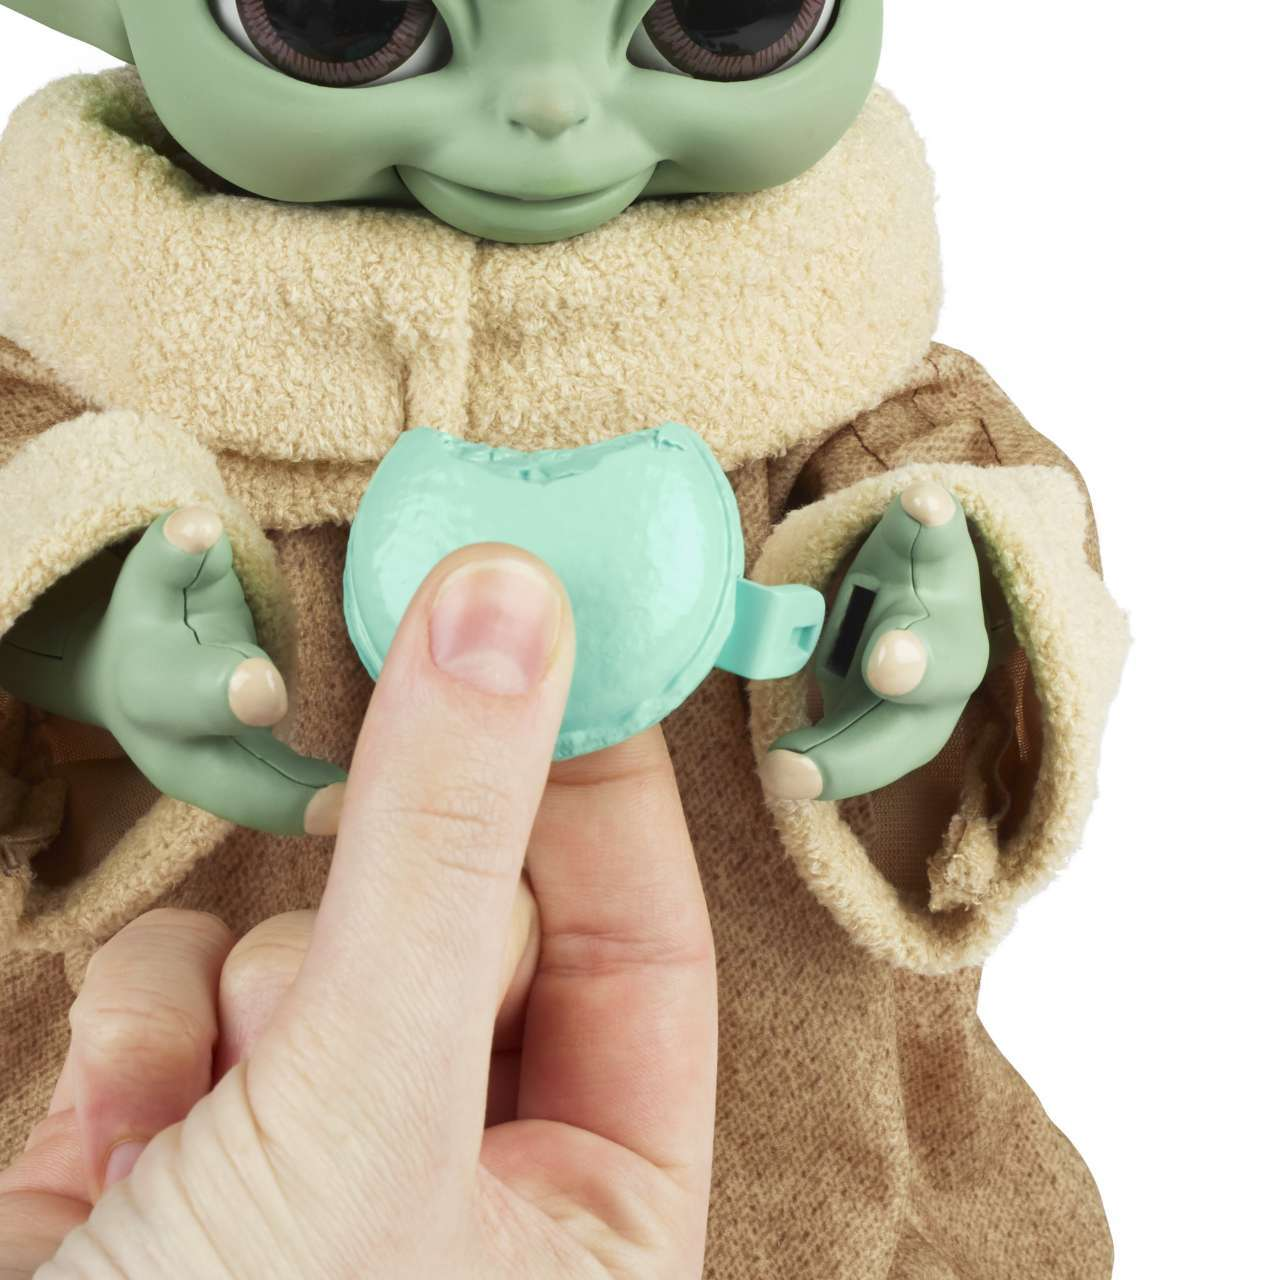 galactic-snackin-baby-yoda-1